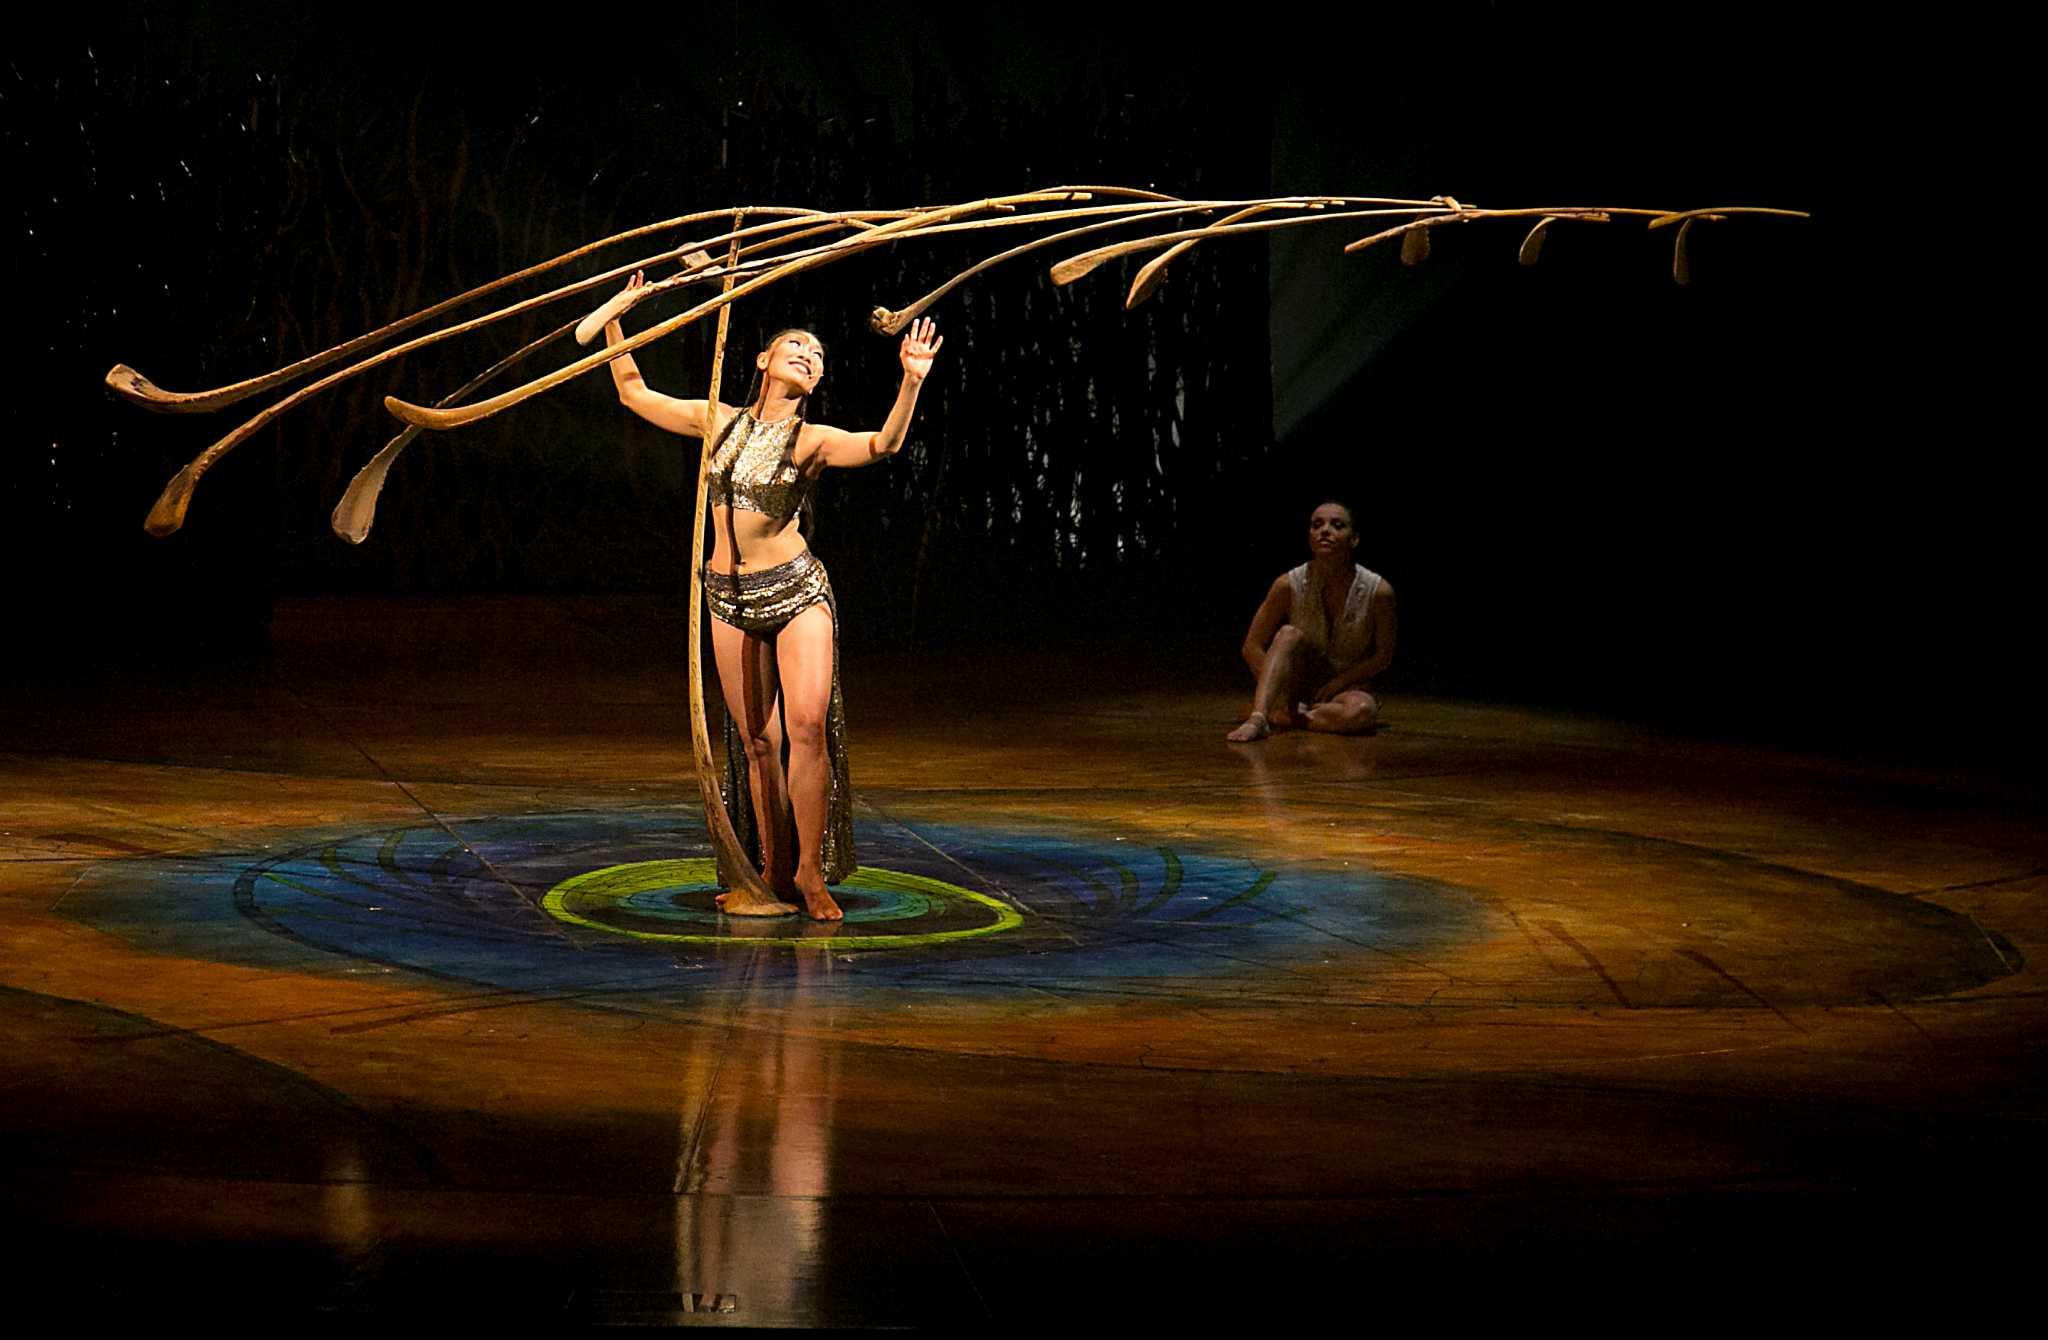 Cirque 39 s 39 amaluna 39 soars in shakespeare inspired show - Image soleil rigolo ...